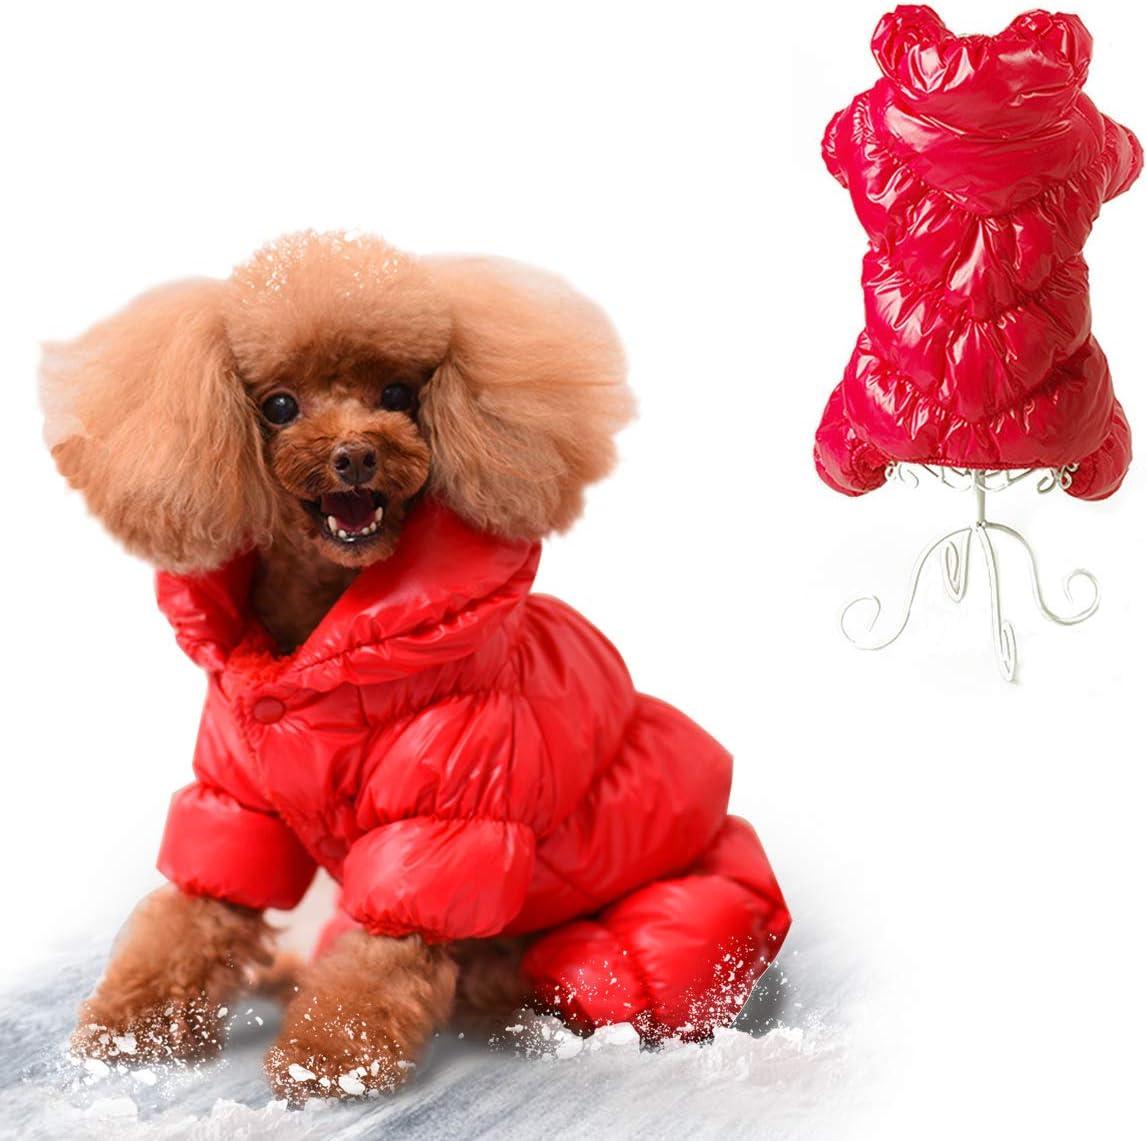 Sytaun Pet Clothes,Dog Jumpers,Winter Warm Clothes,Pet Dogs Cat Raincoat Dinosaur Jacket Rainwear Waterproof 4-Legs Hooded Coat Red S